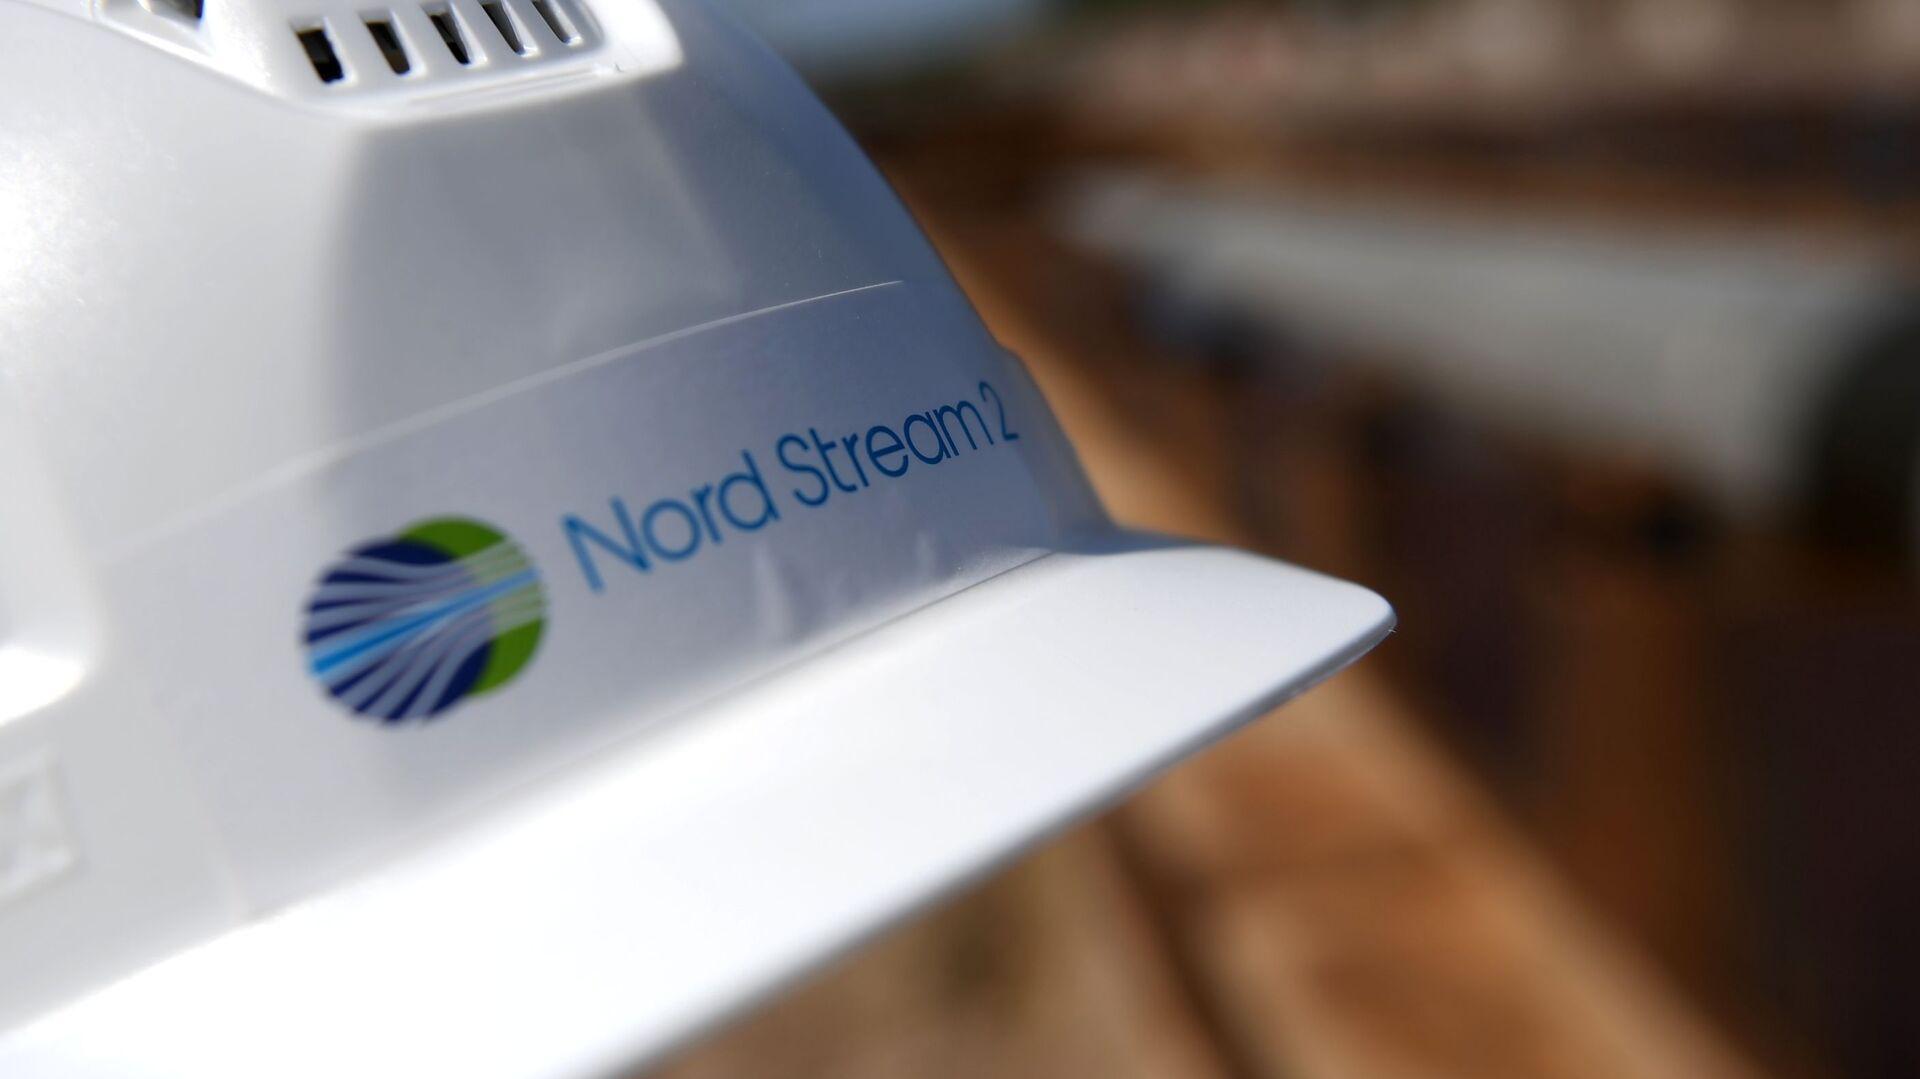 Budowa Nord Stream 2 w Petersburgu - Sputnik Polska, 1920, 18.08.2021